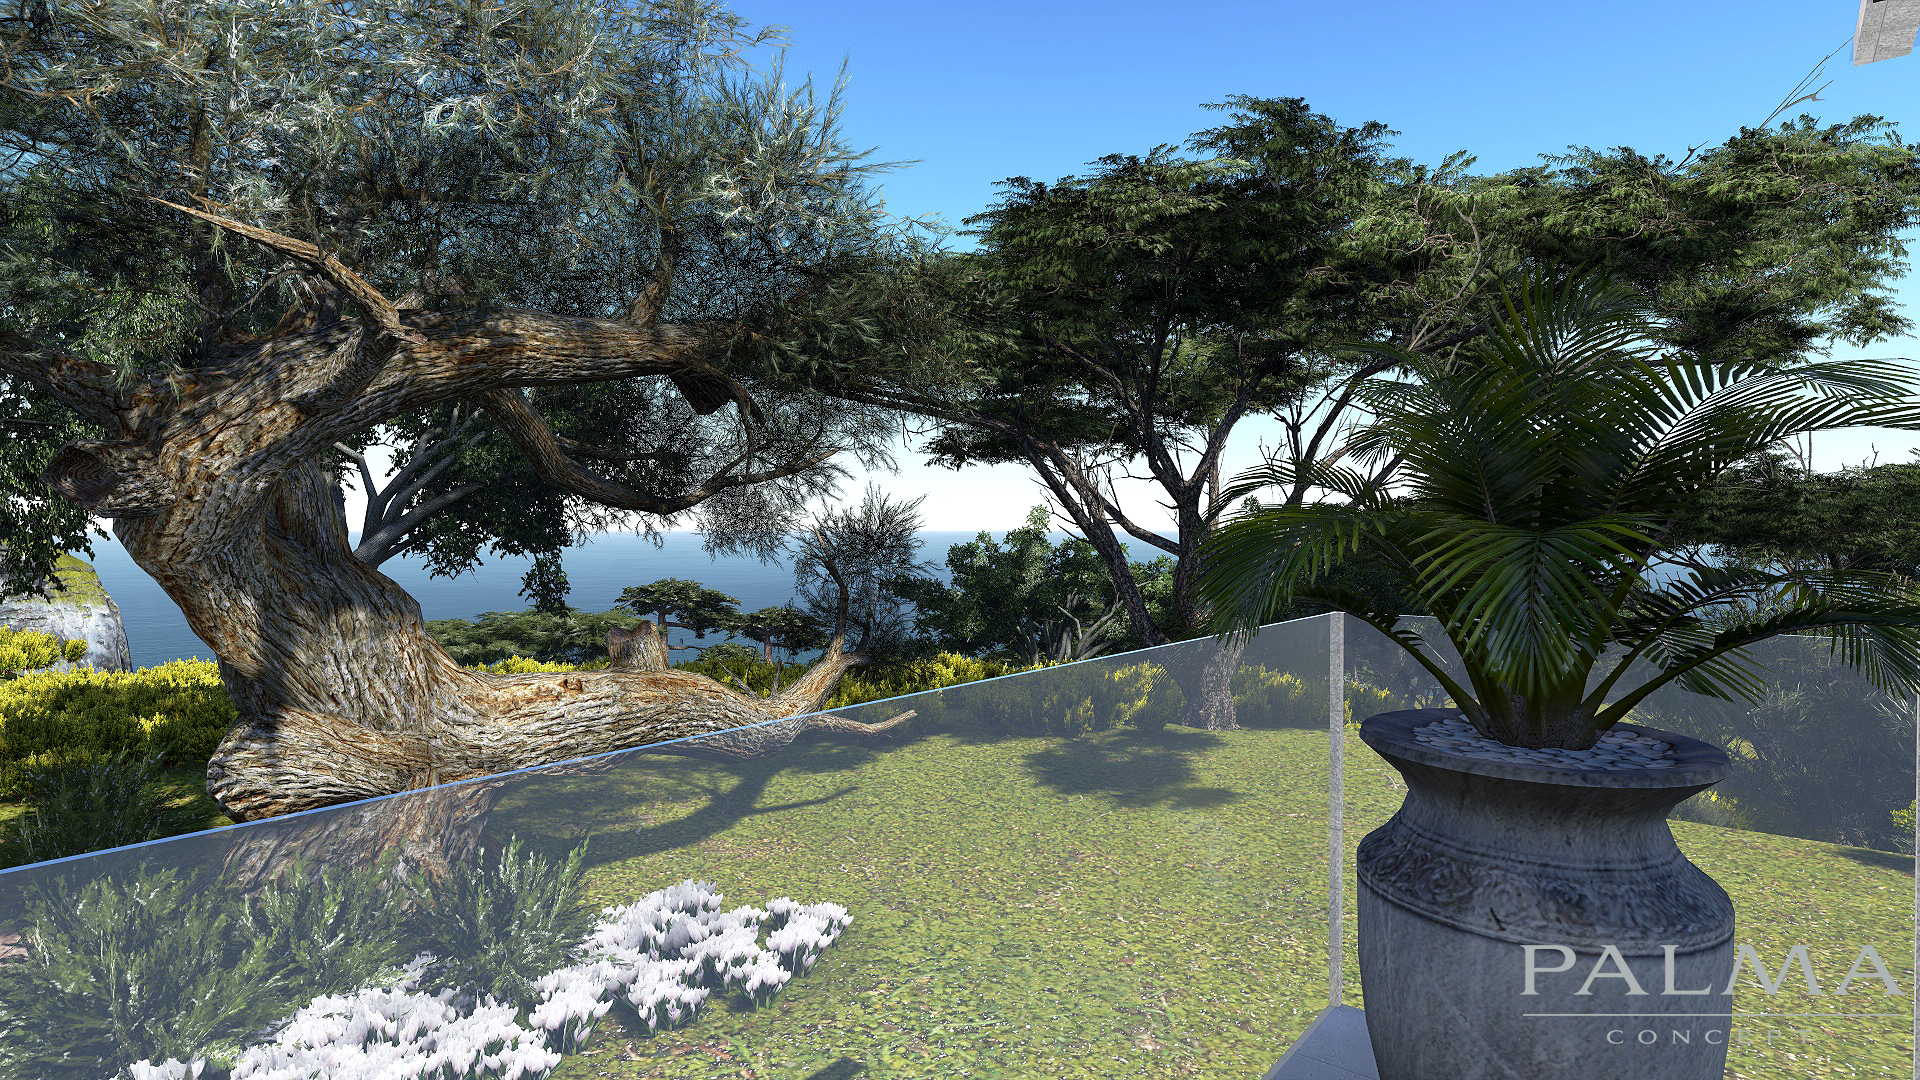 MEDITERRANEAN-PINE-TREES-1